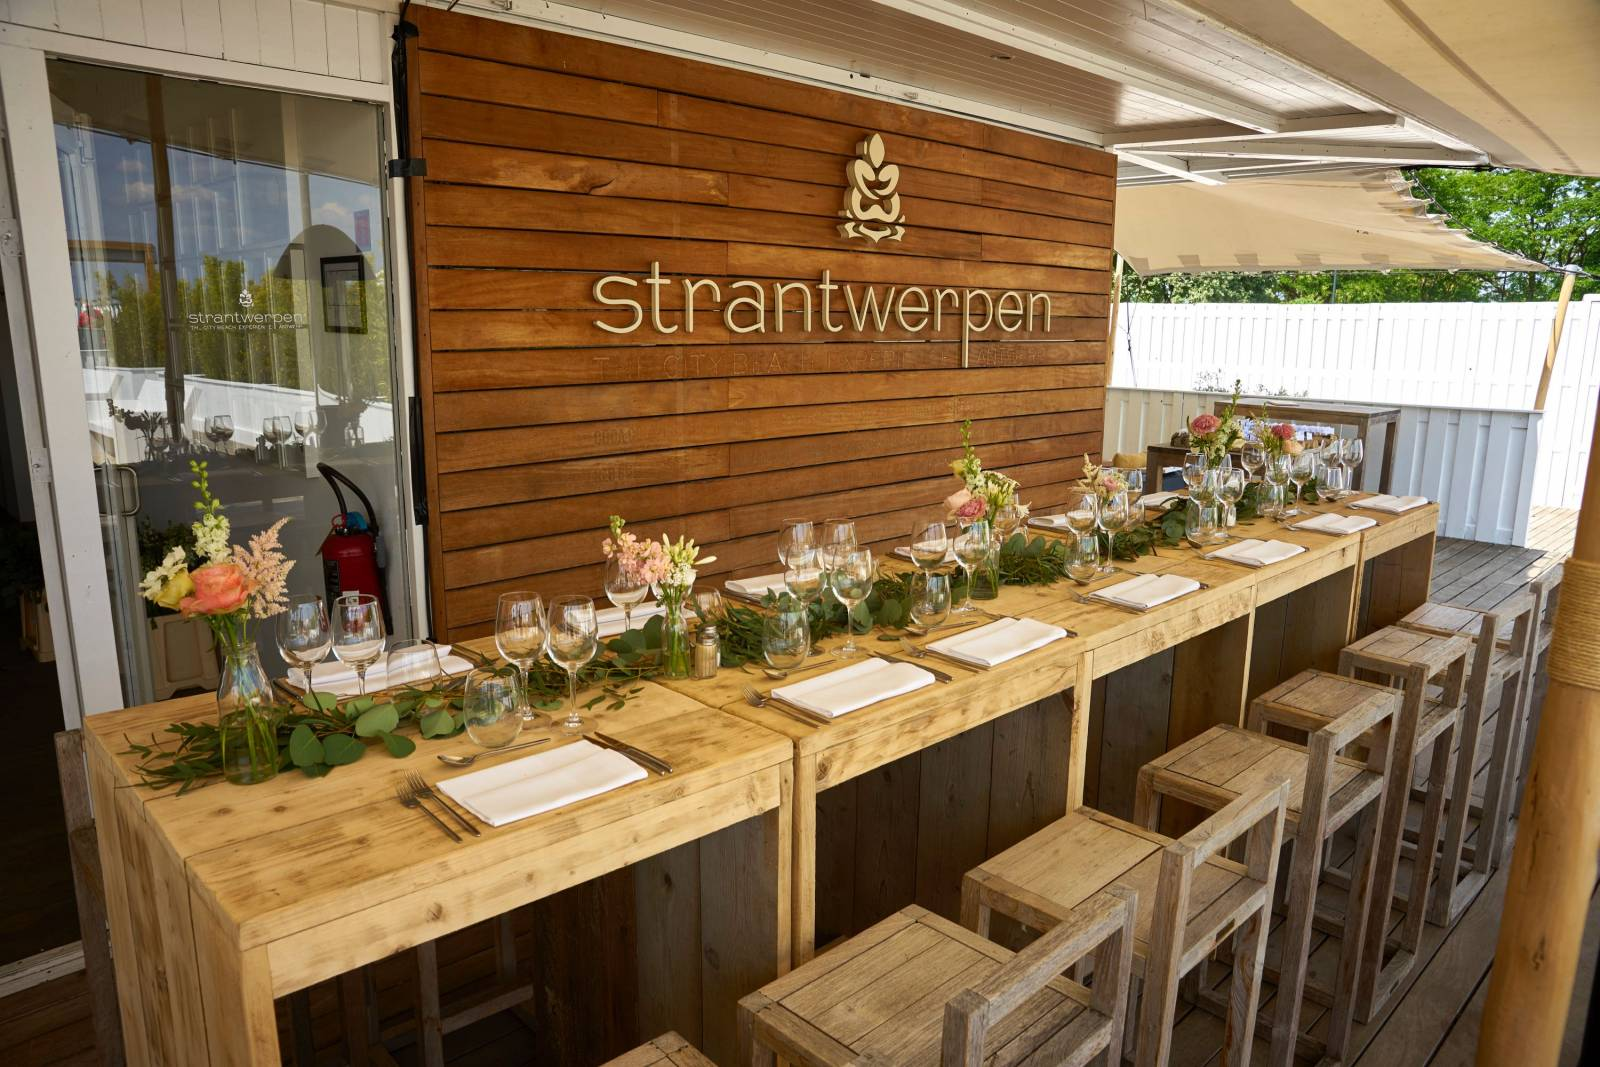 Strantwerpen - Feestzaal - Trouwzaal - Trouwen op het Strand - House of Weddings - 10